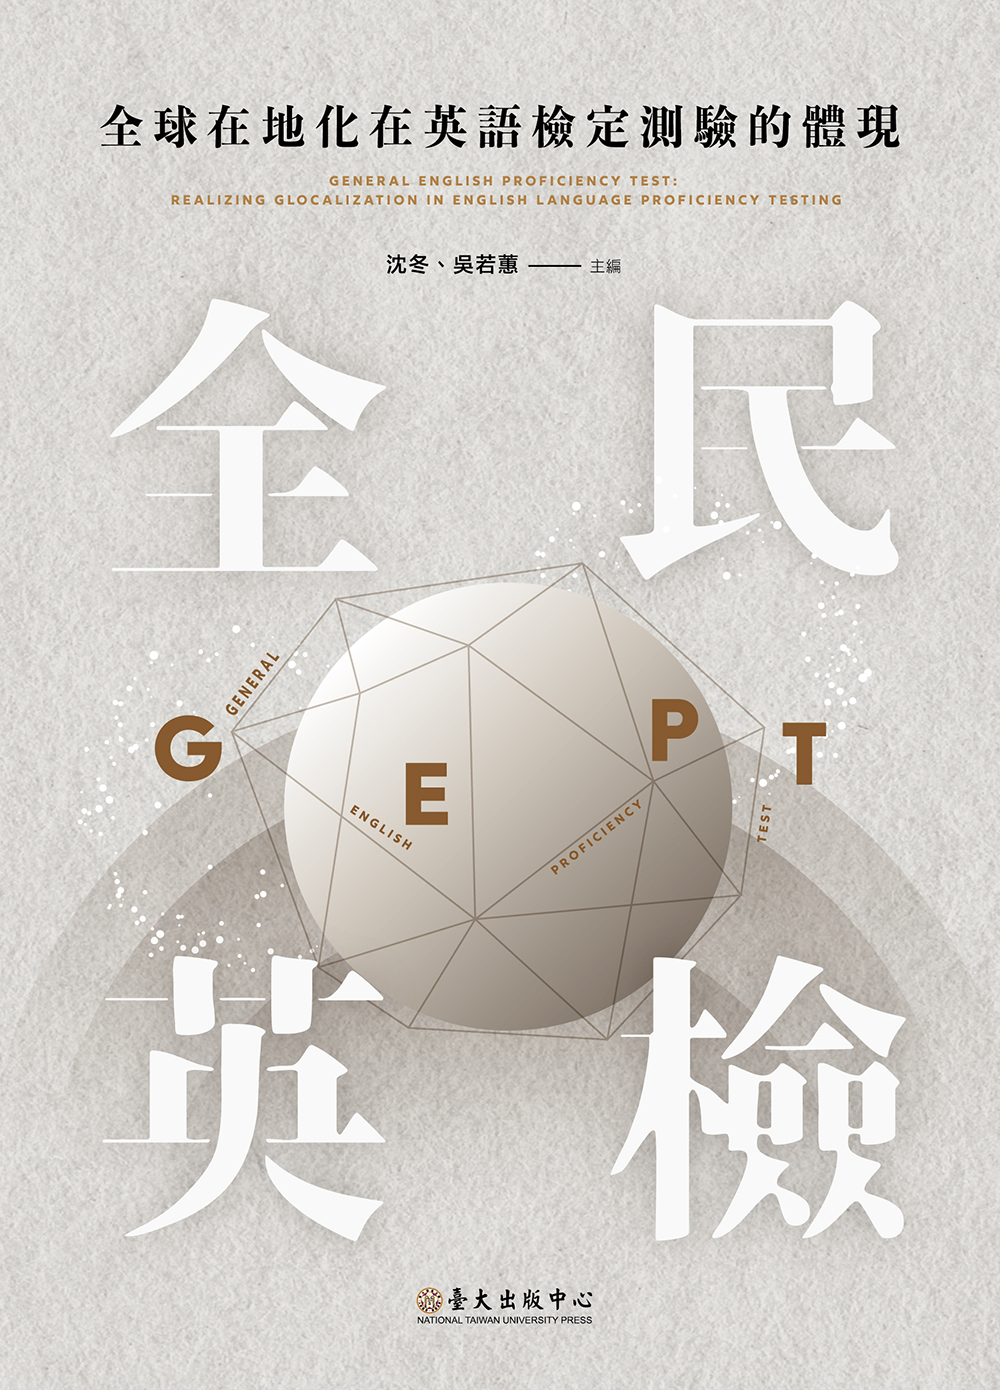 General English Proficiency Test: Realizing Glocalization in English Language Proficiency Testing